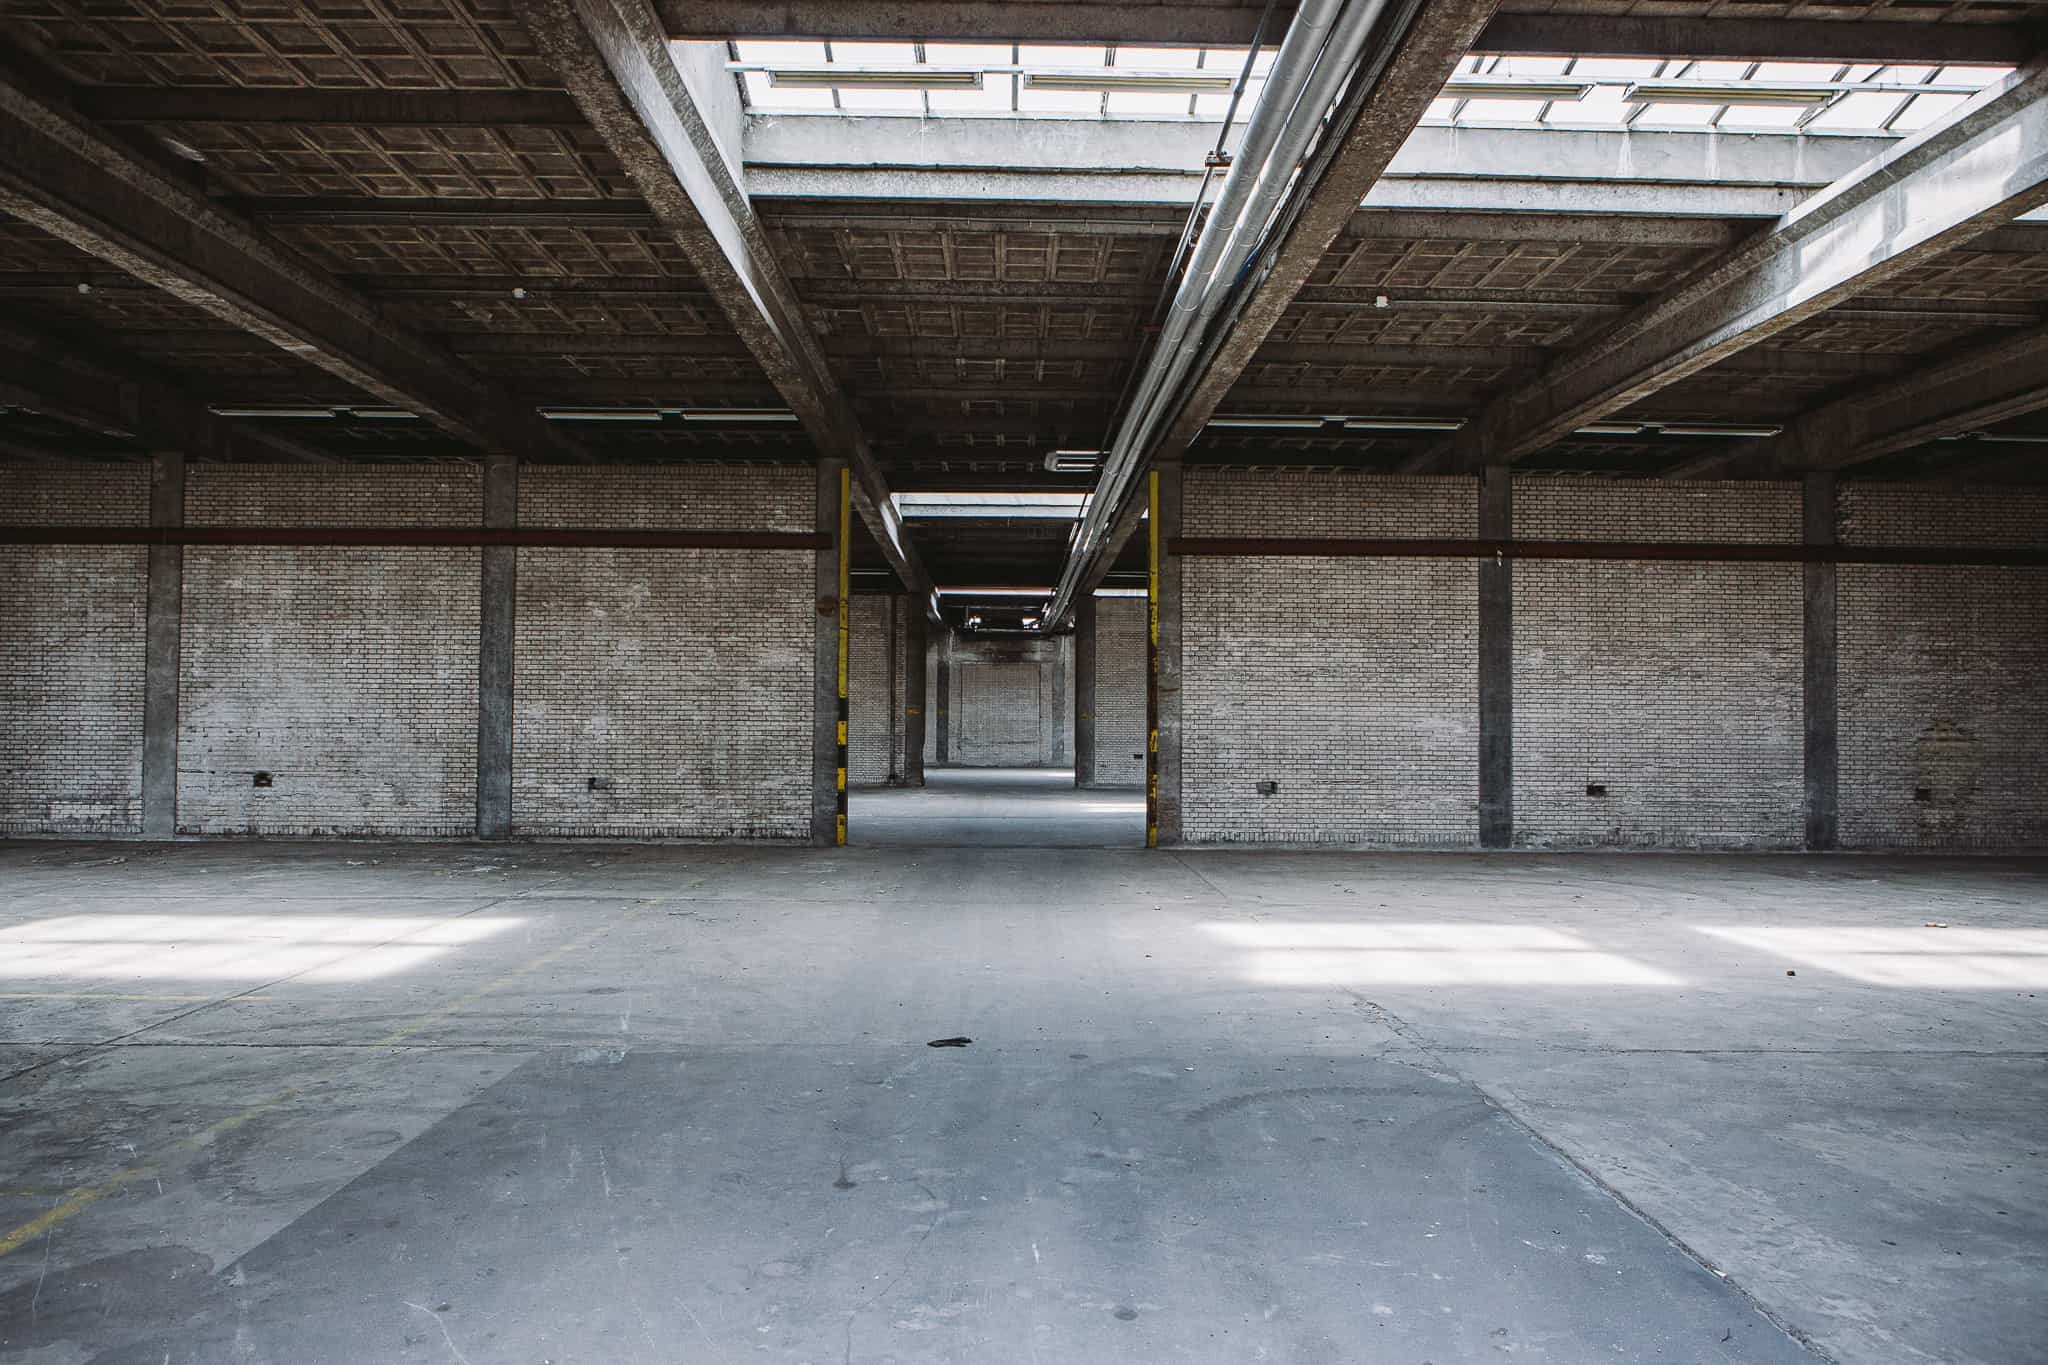 EKI_Nijmegen_11 - papierfabriek - industreel - locatie